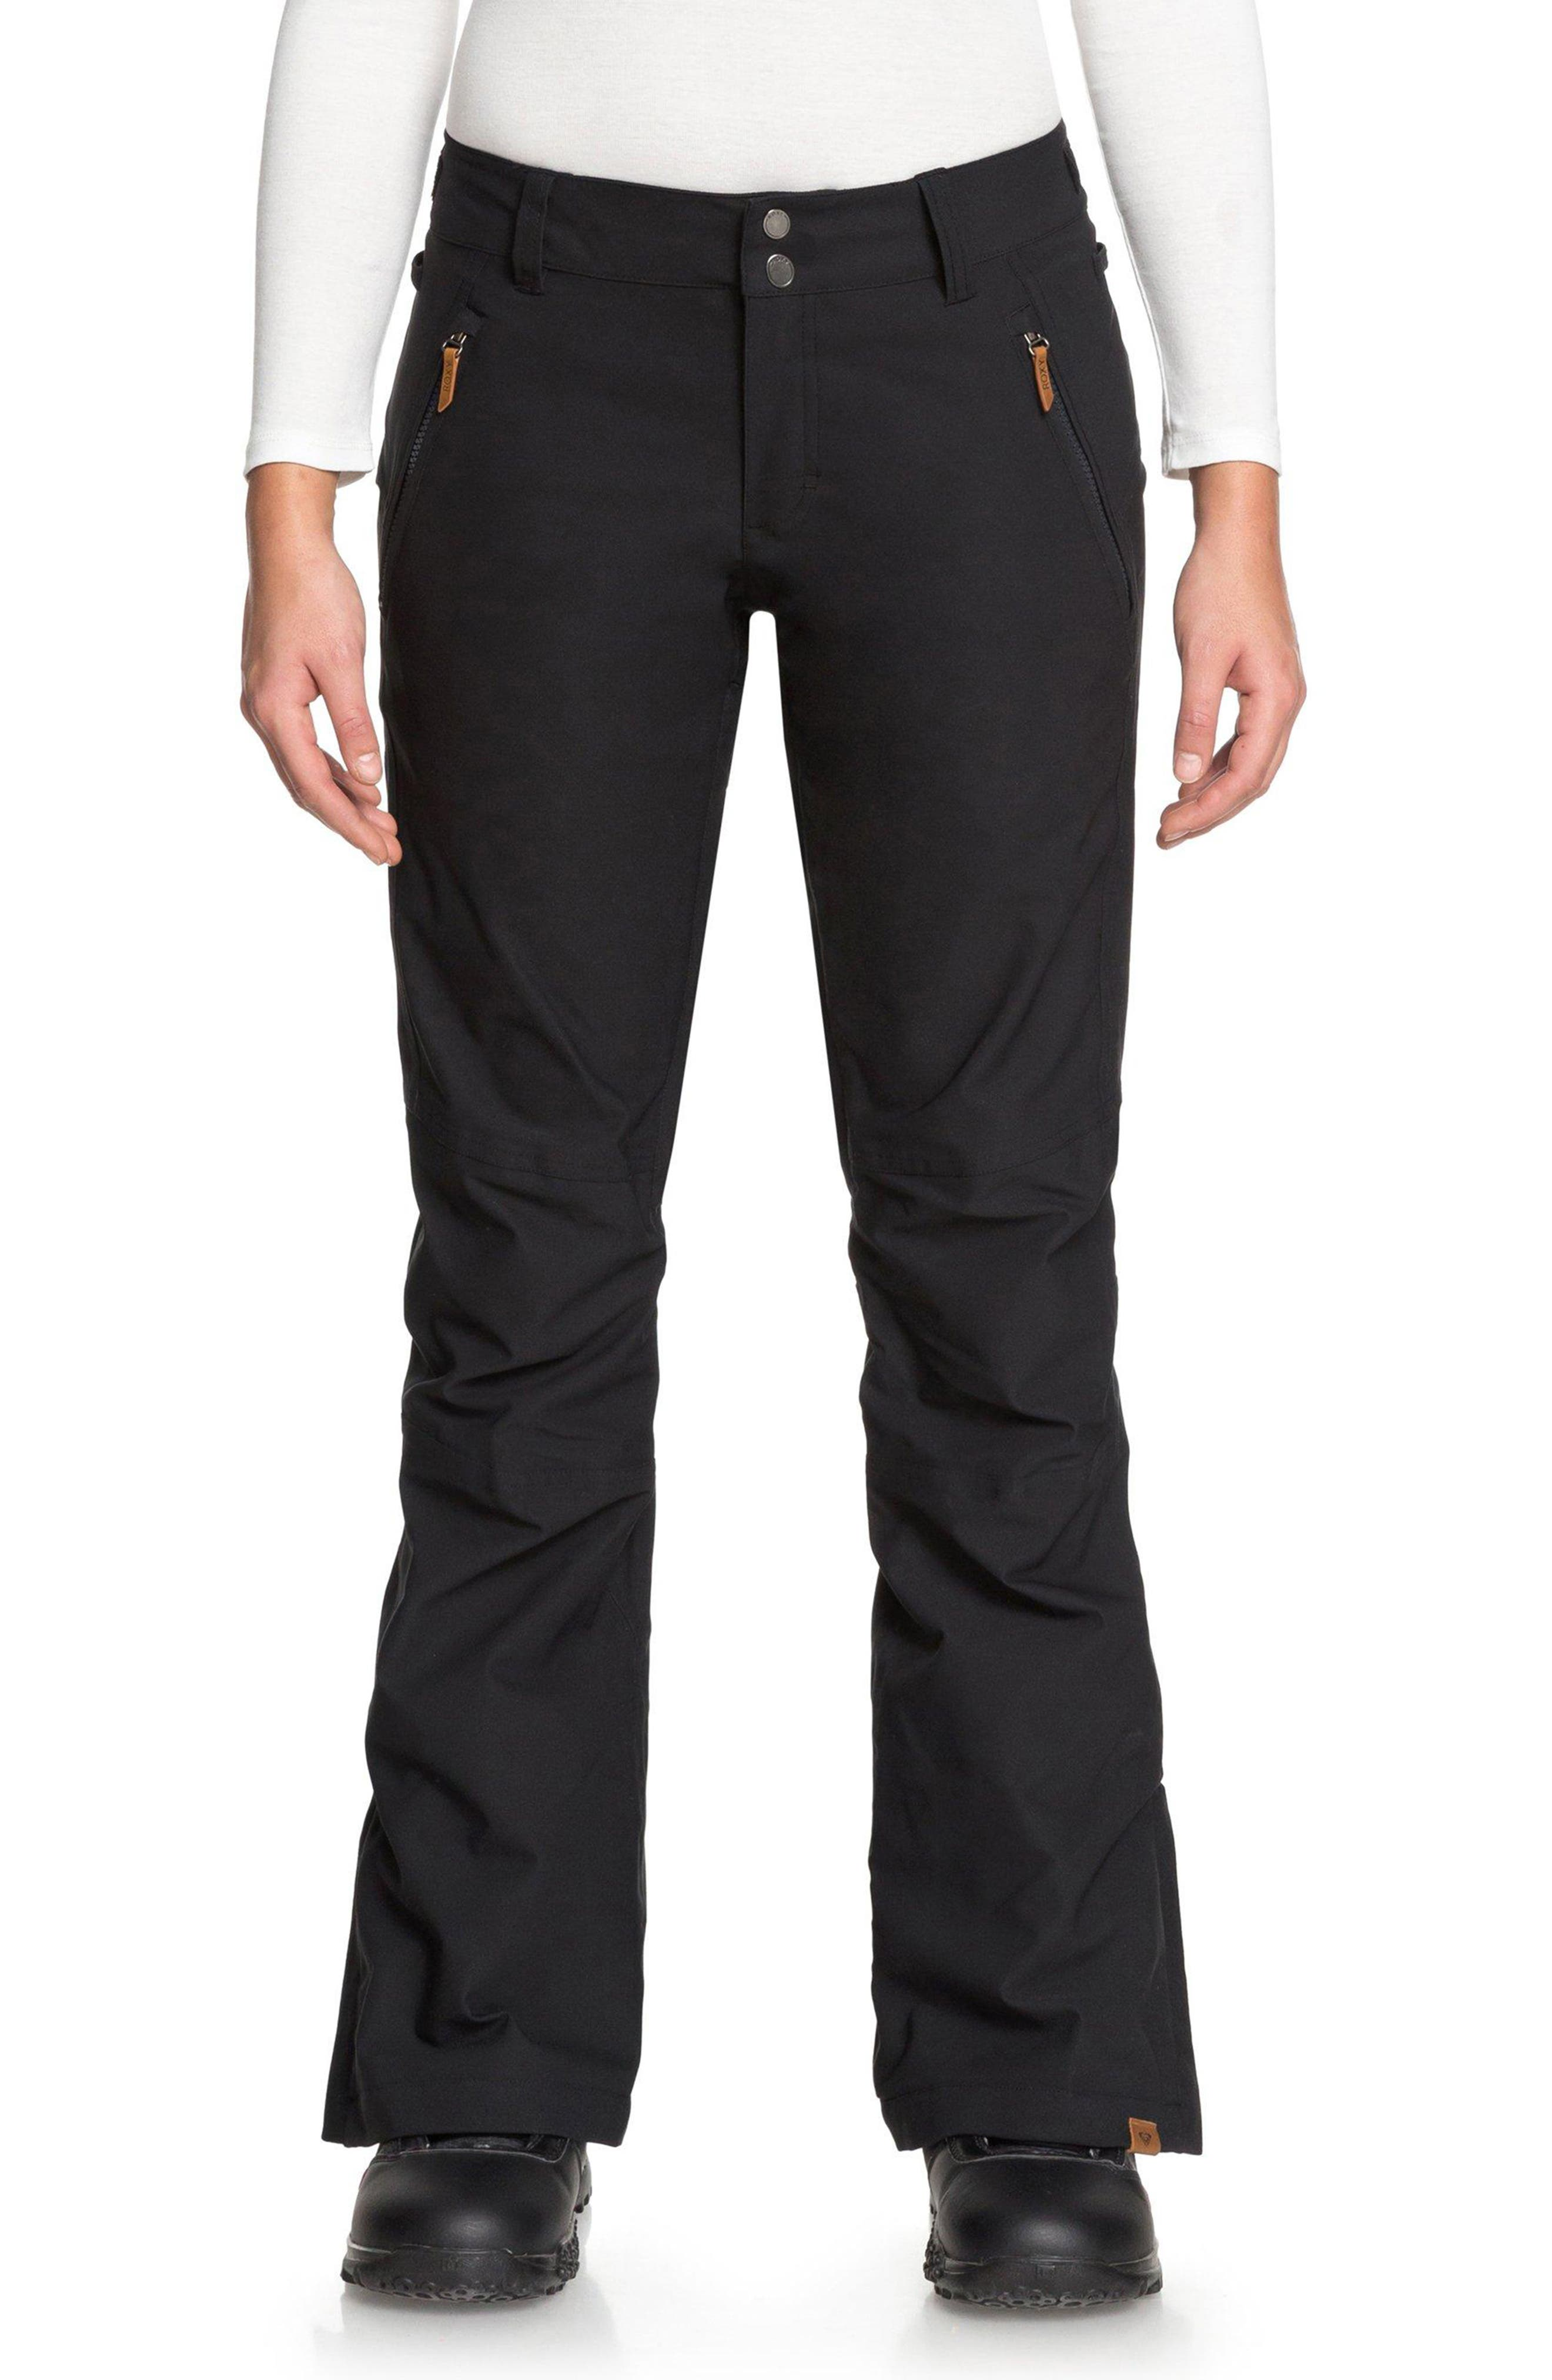 ROXY Cabin Snow Pants, Main, color, 002